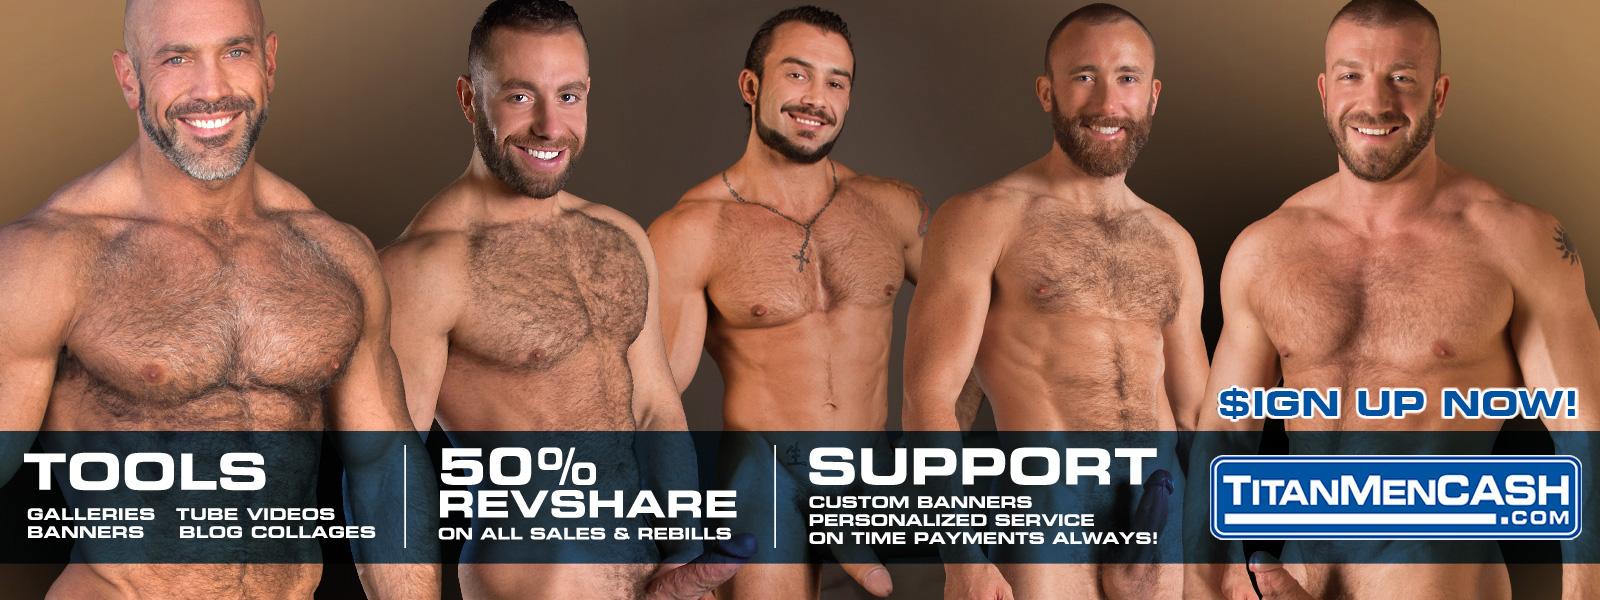 Affiliate Porn Program titanmencash affiliate program - promote hd gay porn!